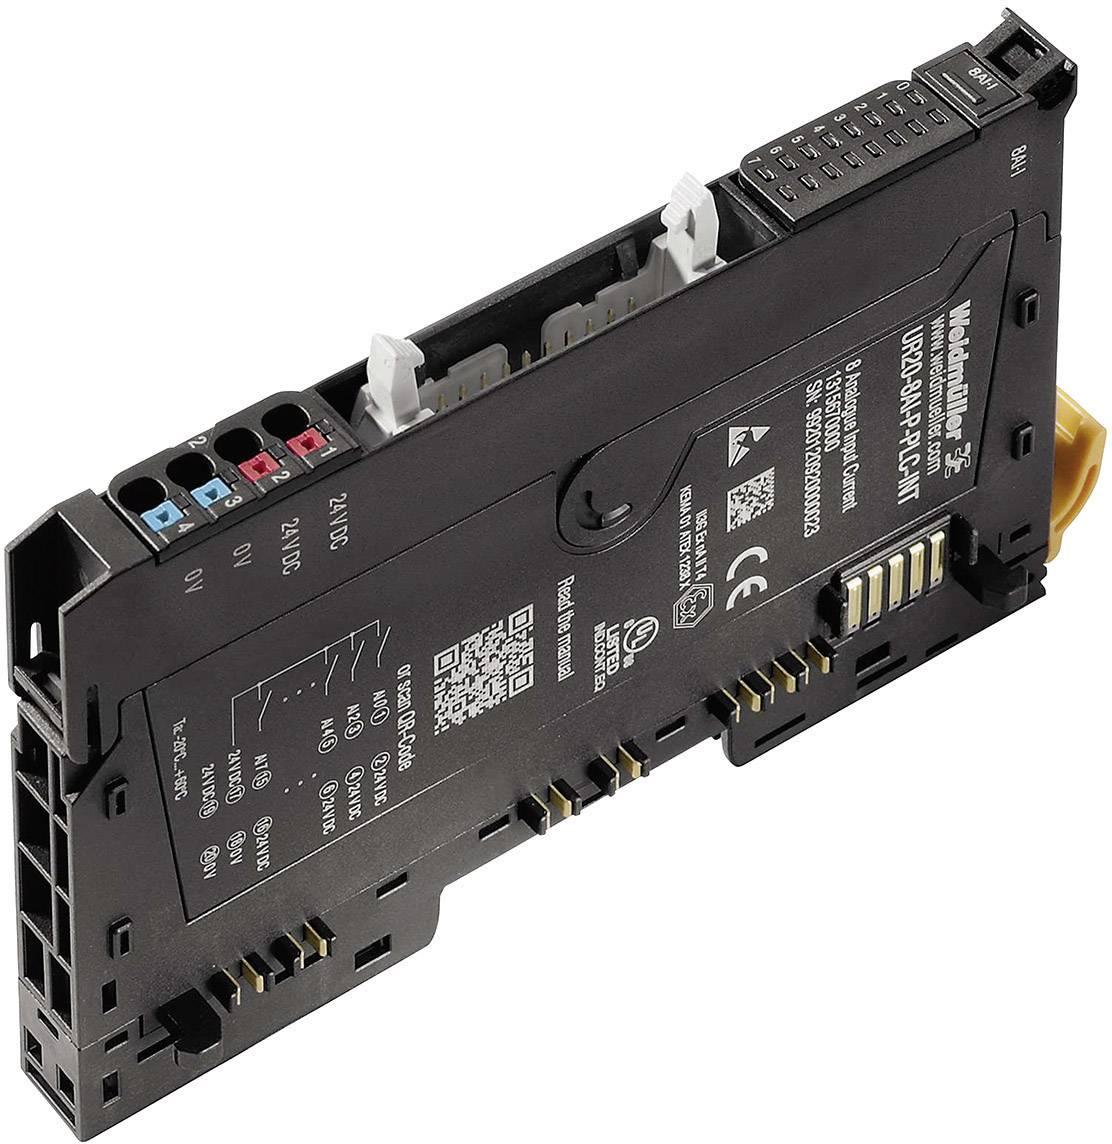 Rozšiřující modul pro PLC Weidmüller UR20-8AI-I-PLC-INT, 1315670000